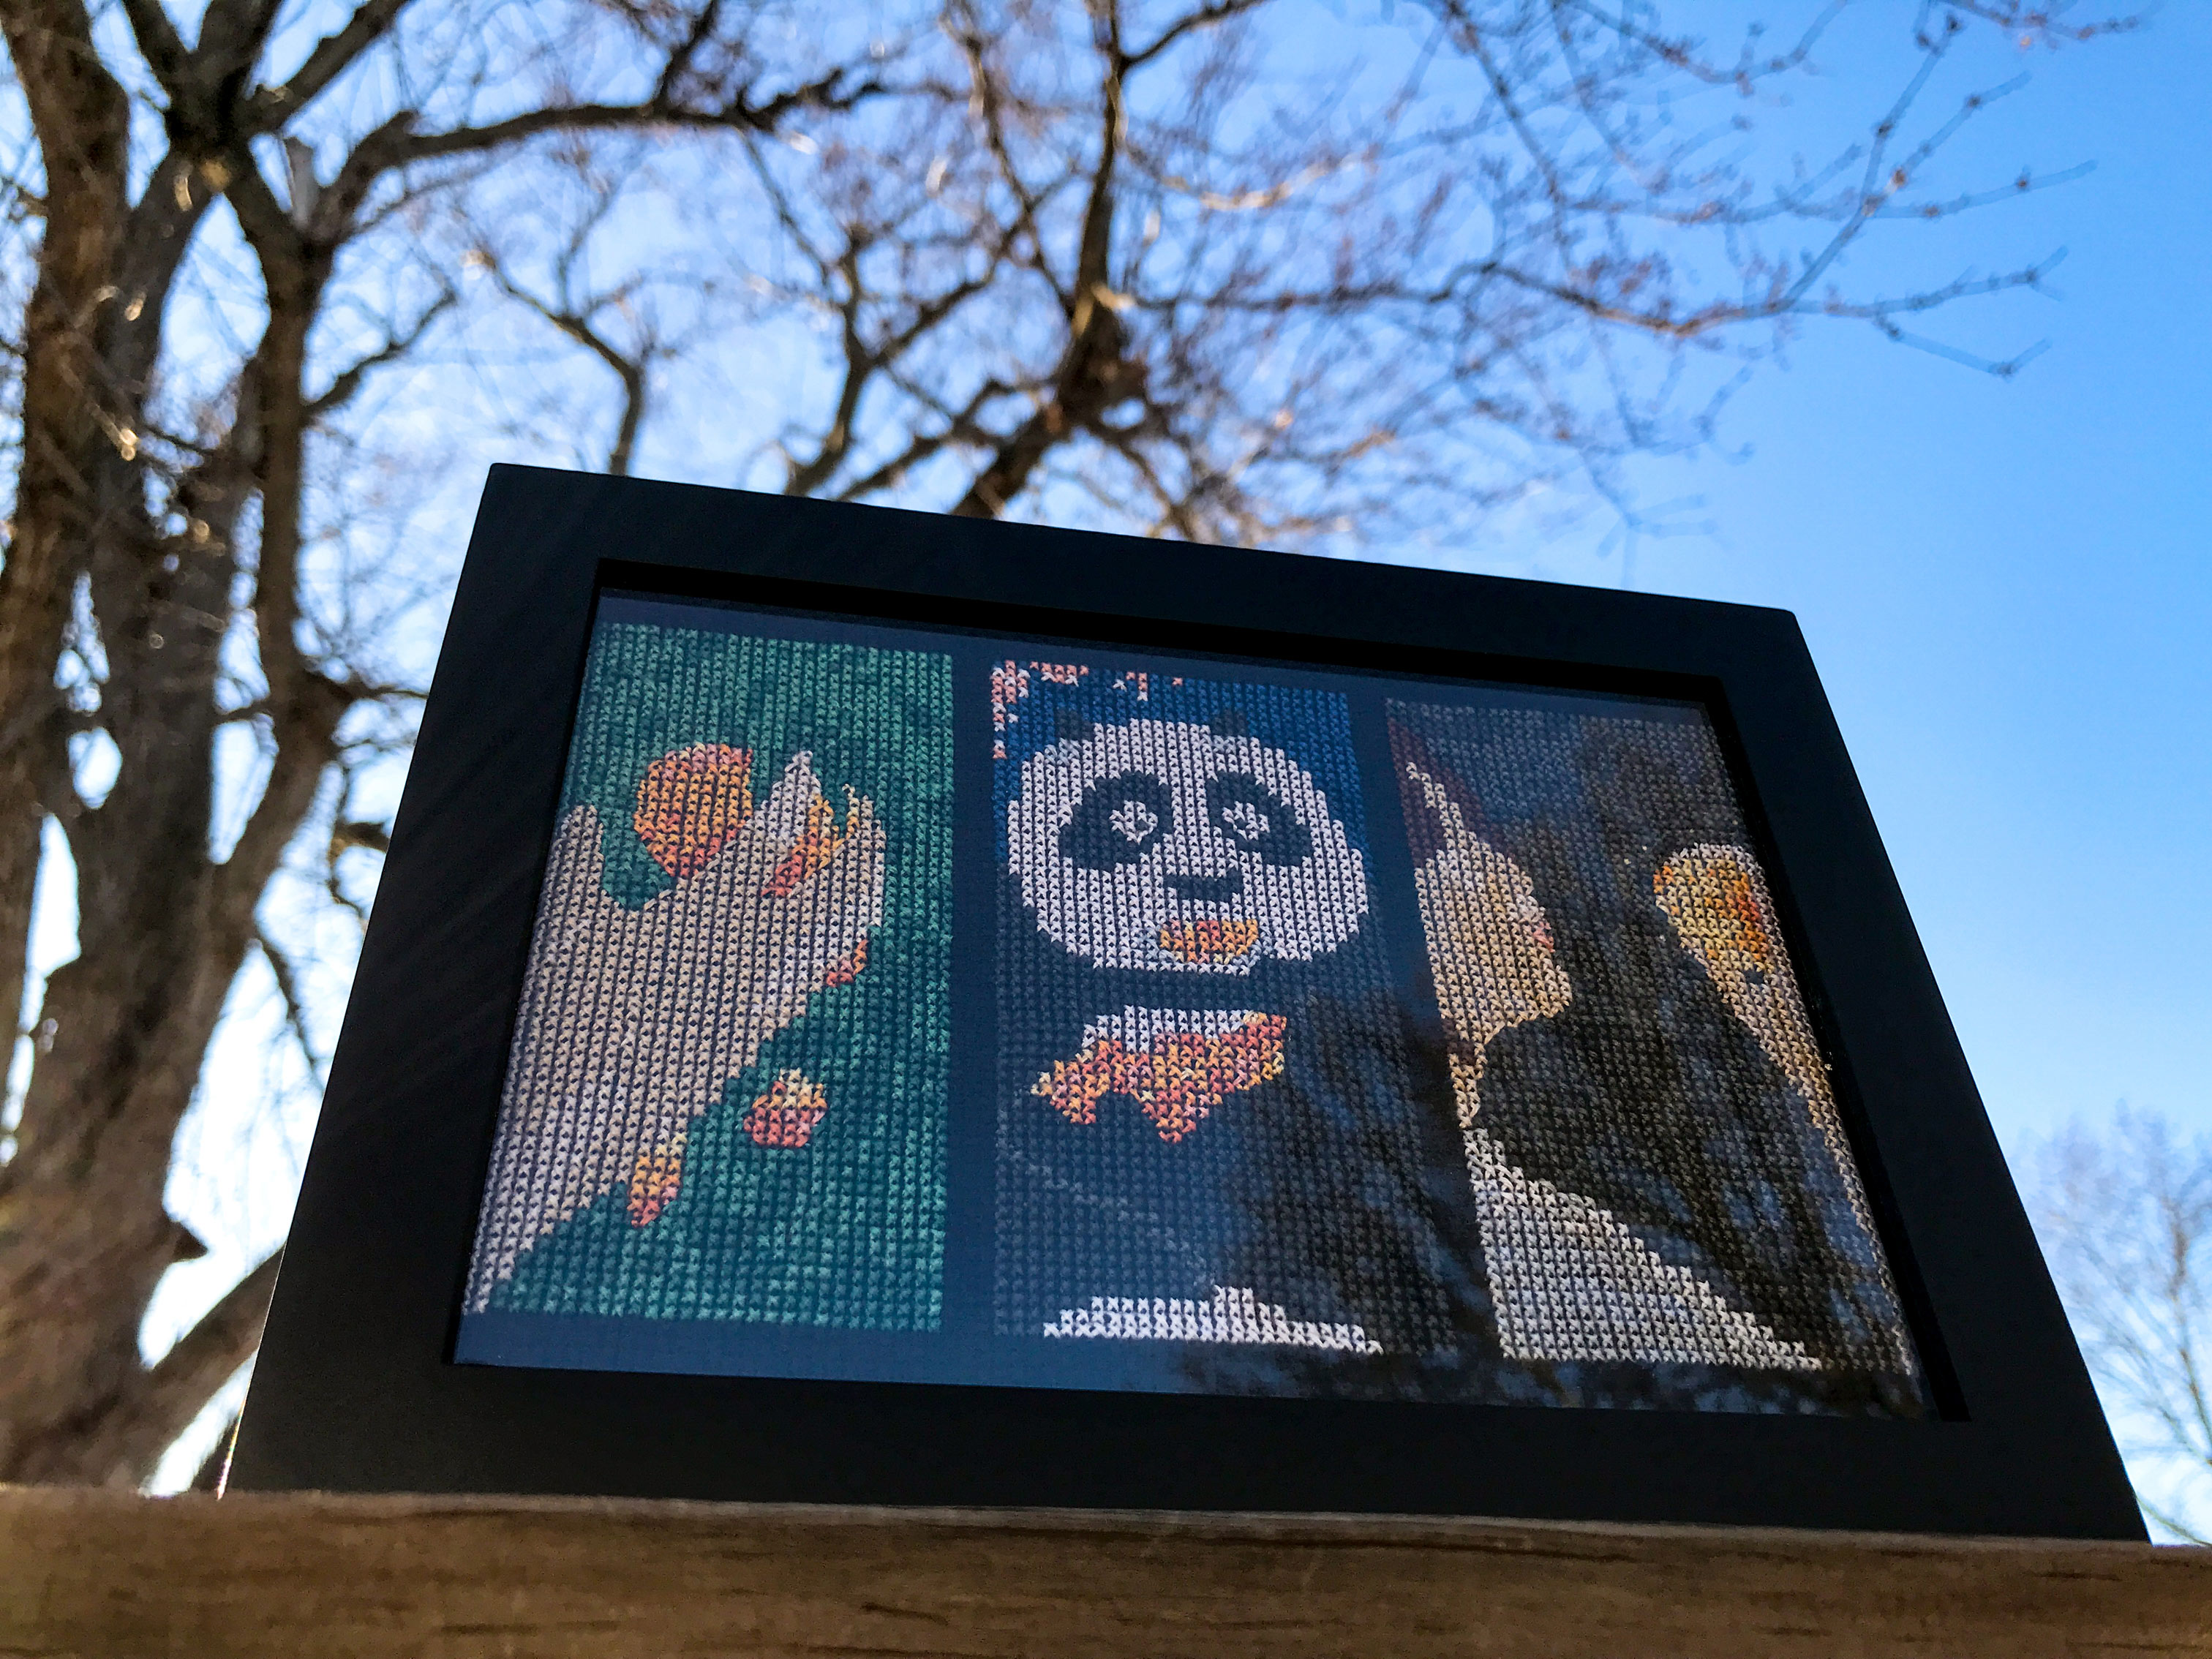 Framed cross stitch depicting three film scenes